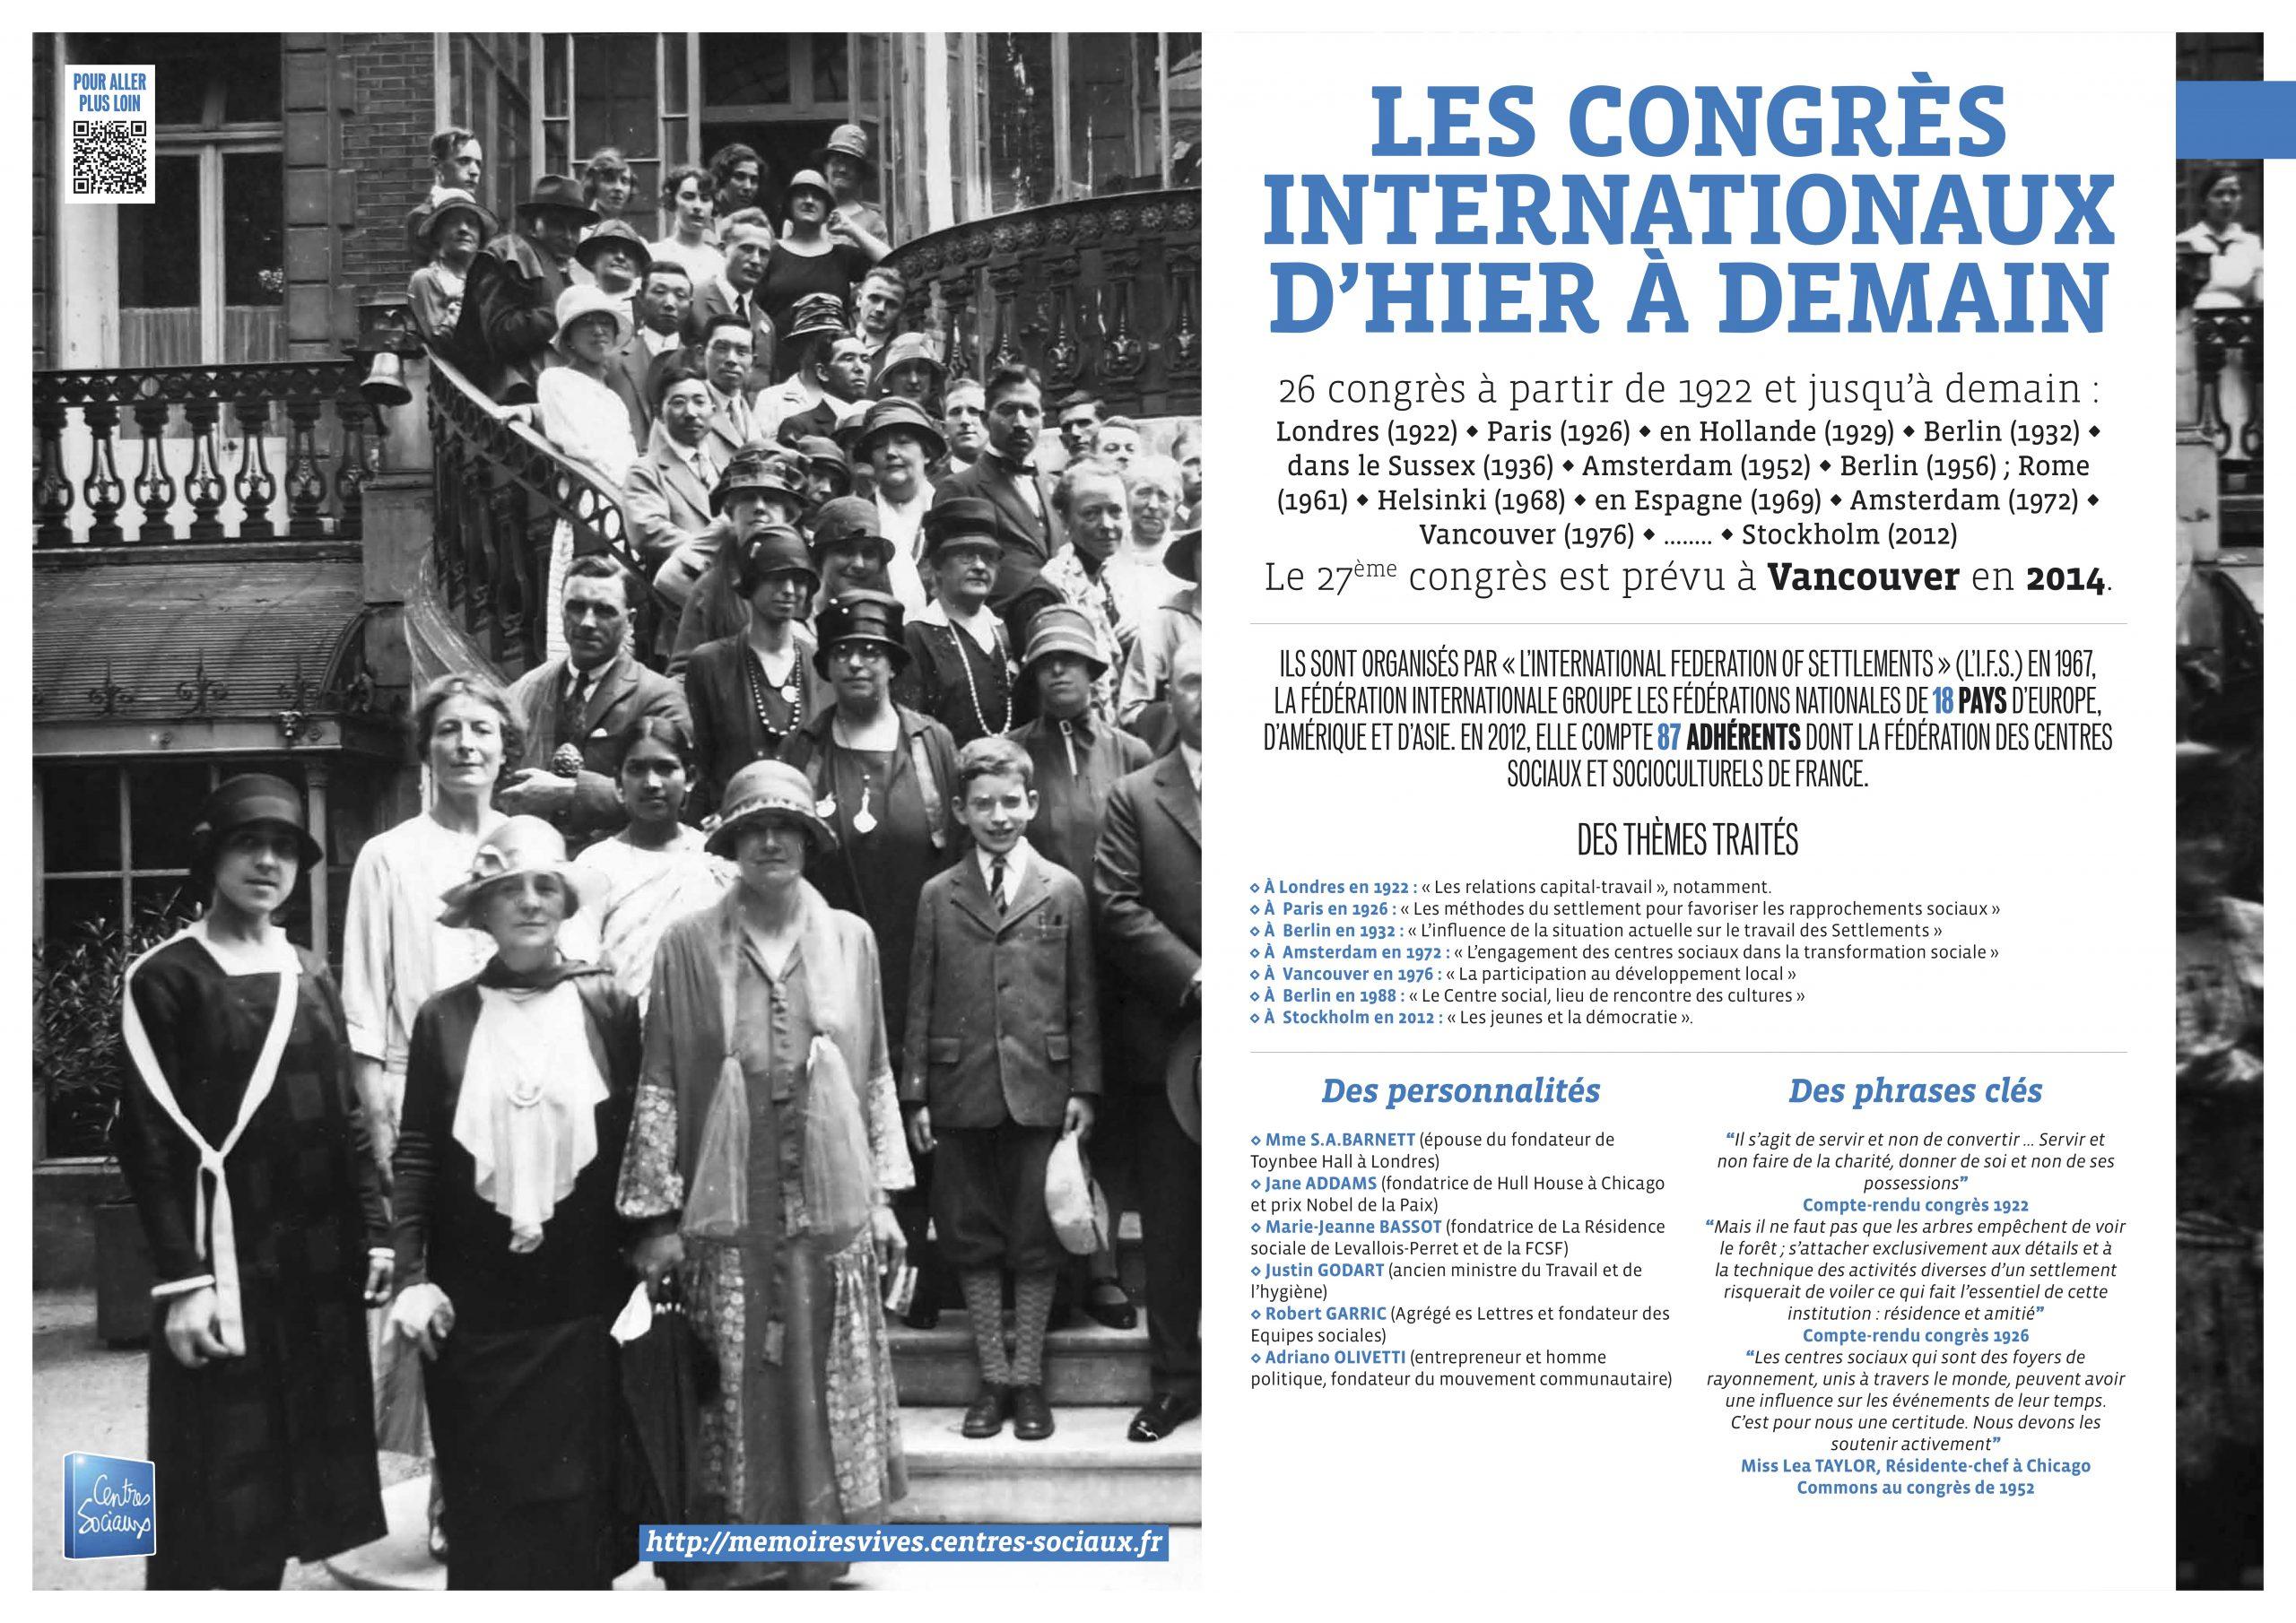 Congrès internationaux